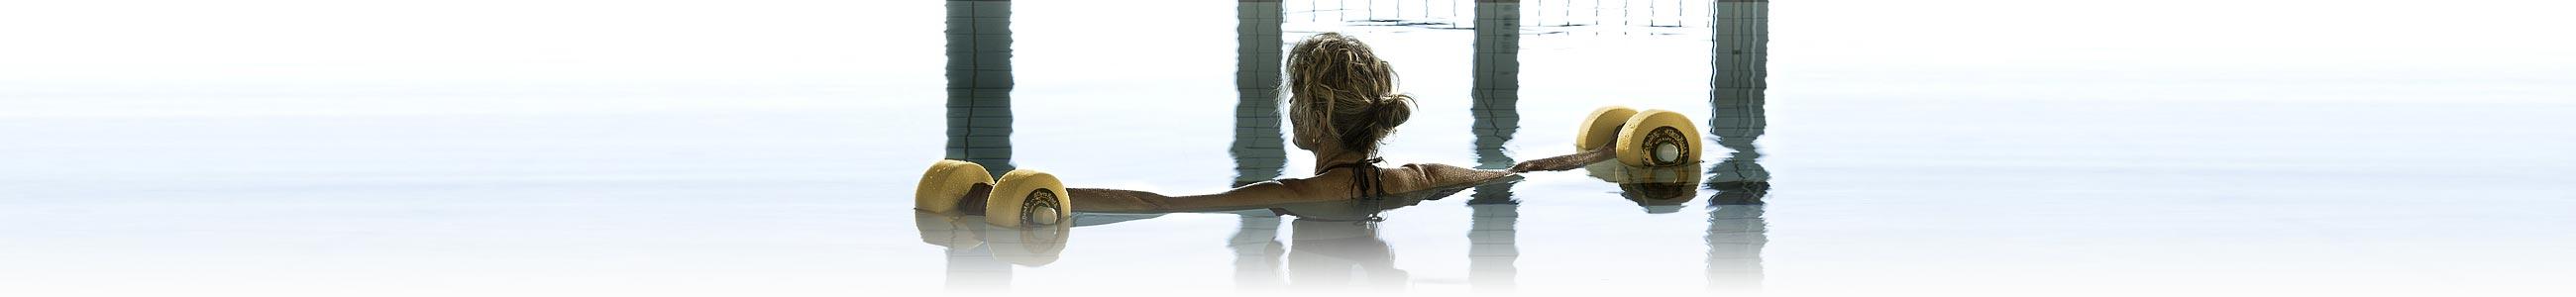 Dame im Hallenbad bei Aquagymnastik